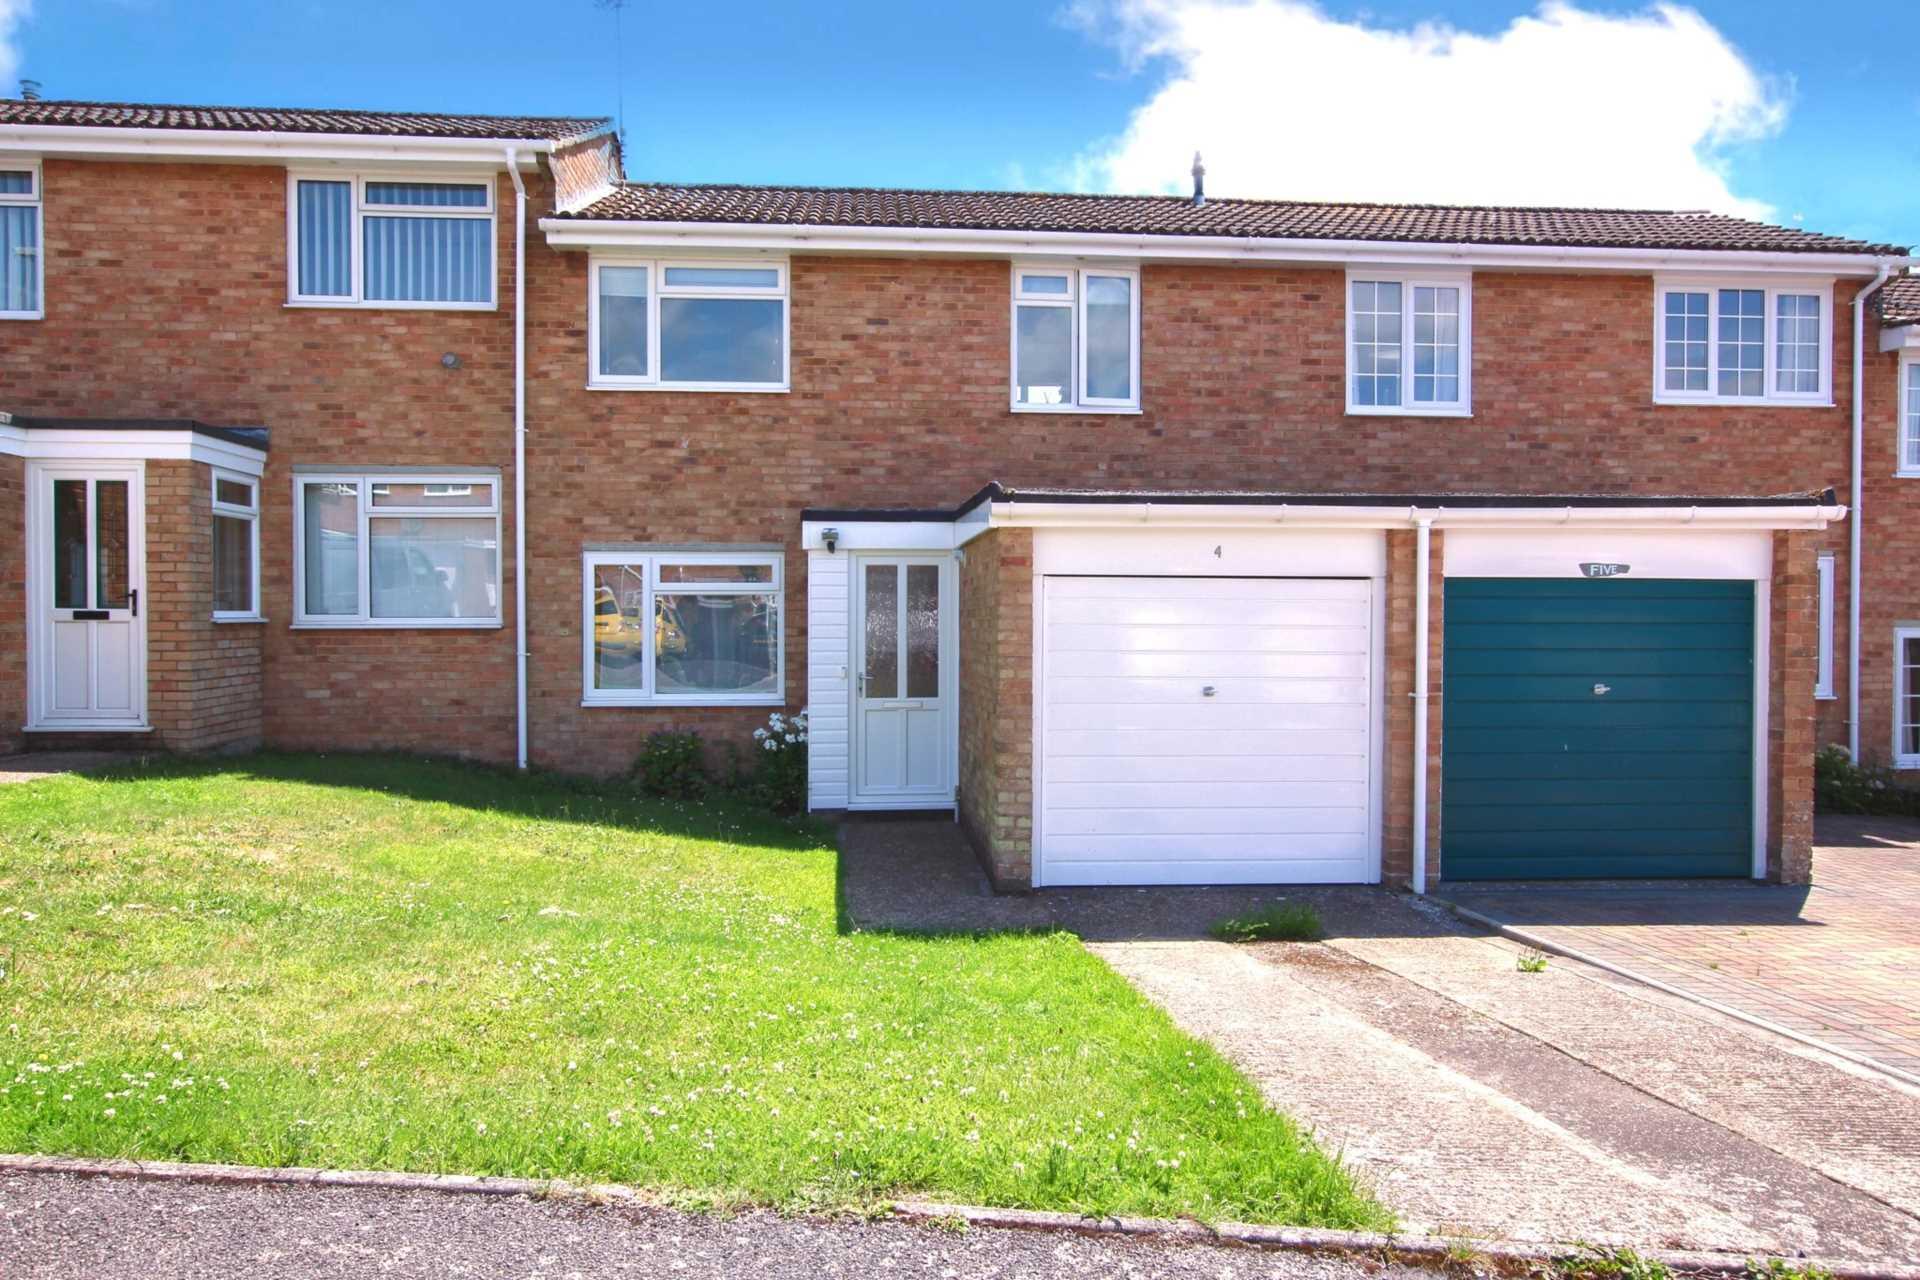 2 bed terraced house for sale in Lockeridge Close, Blandford Forum, Blandford Forum  - Property Image 1